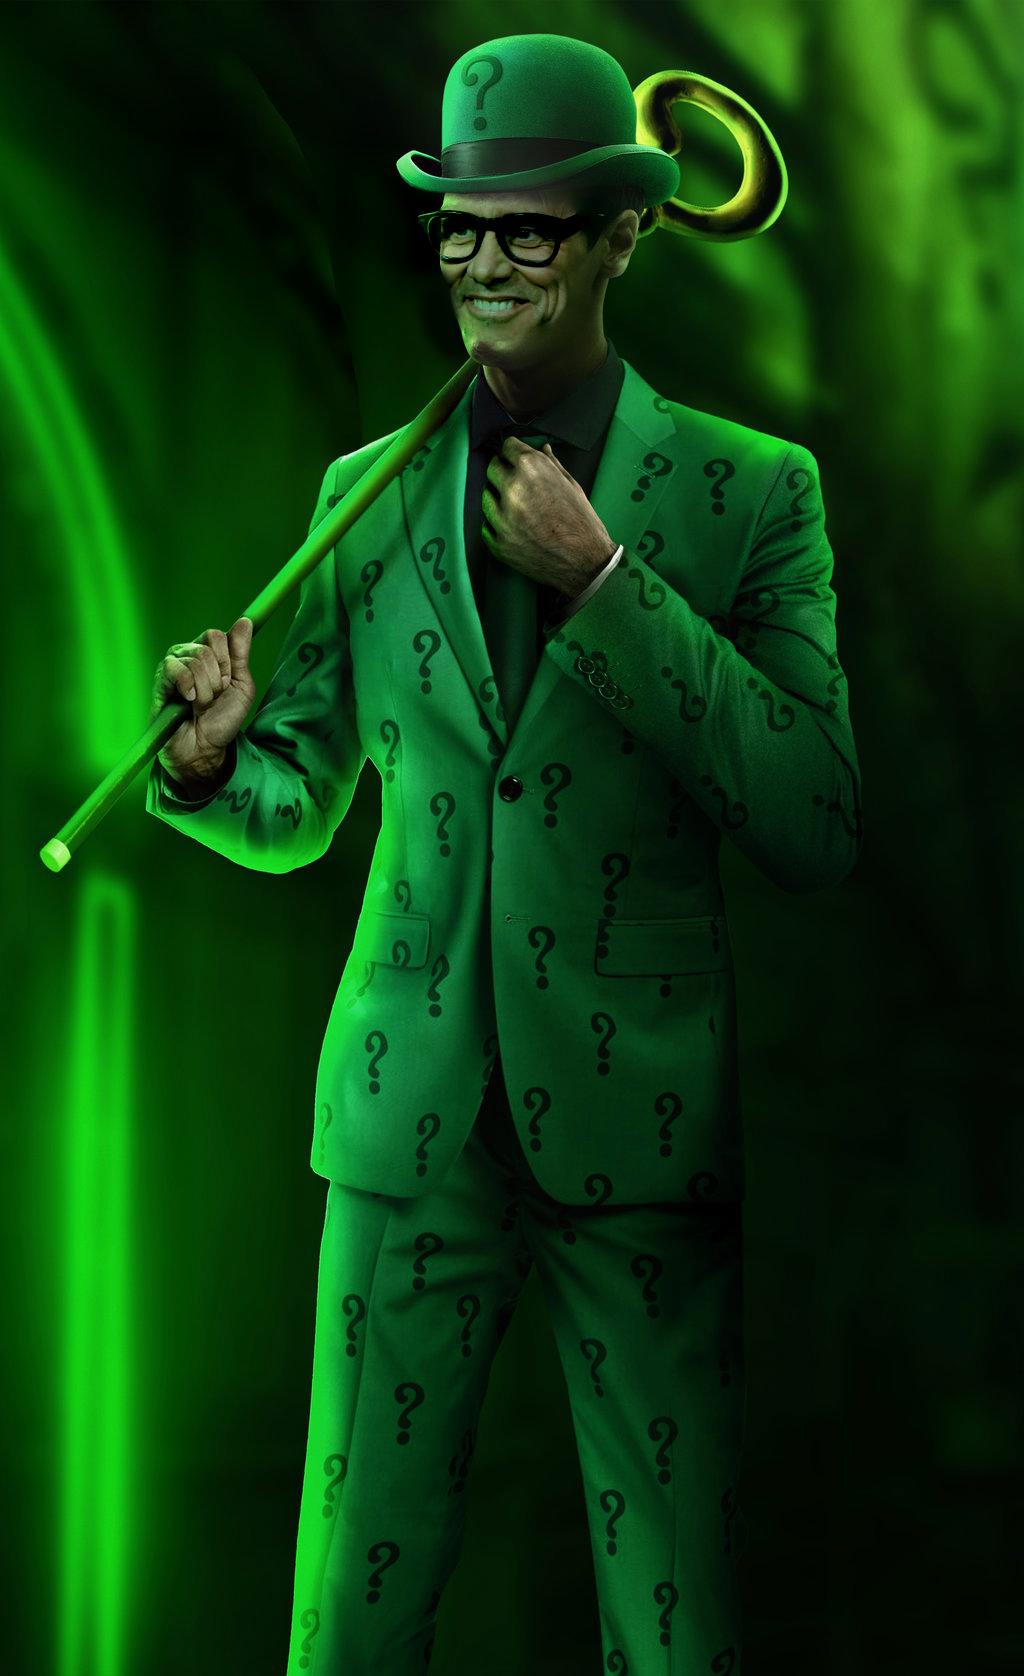 Jim Carrey as the Riddler by Daviddv1202 on DeviantArt